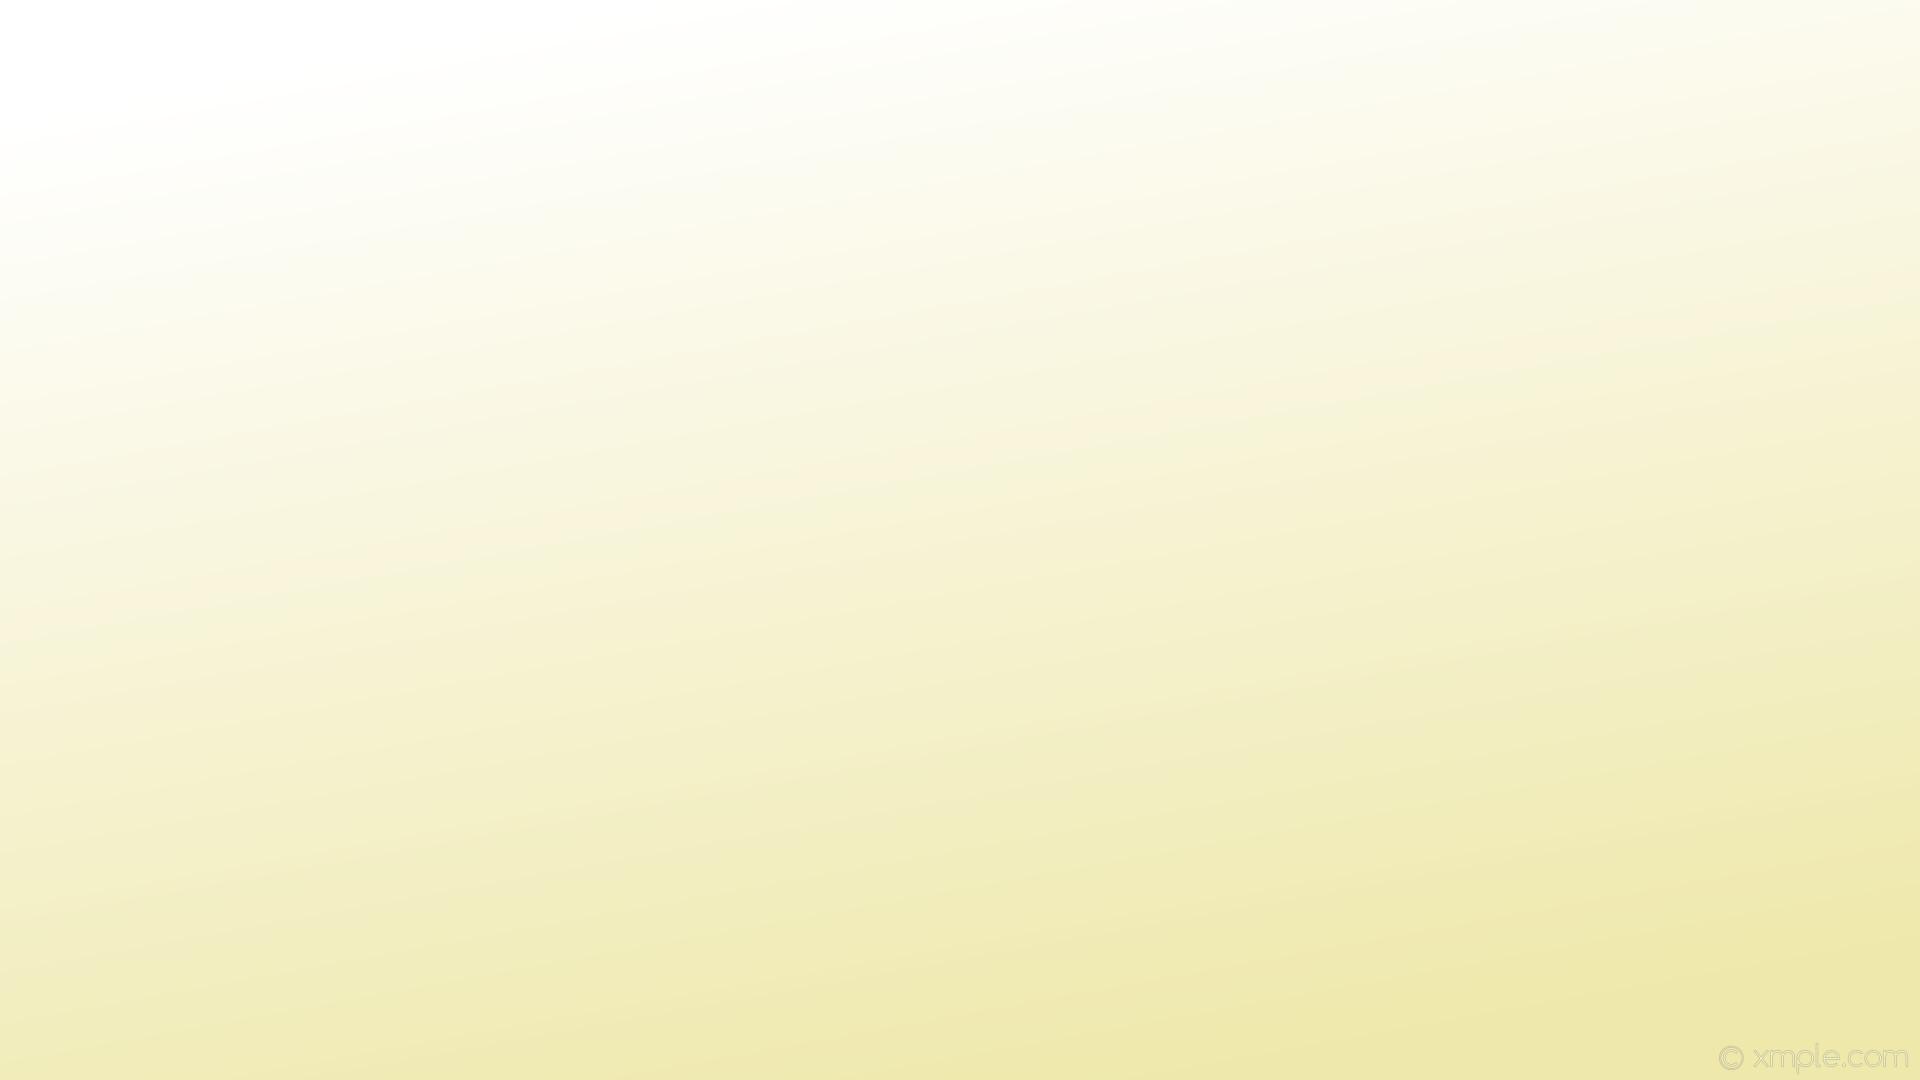 wallpaper white yellow gradient linear pale goldenrod #eee8aa #ffffff 300°